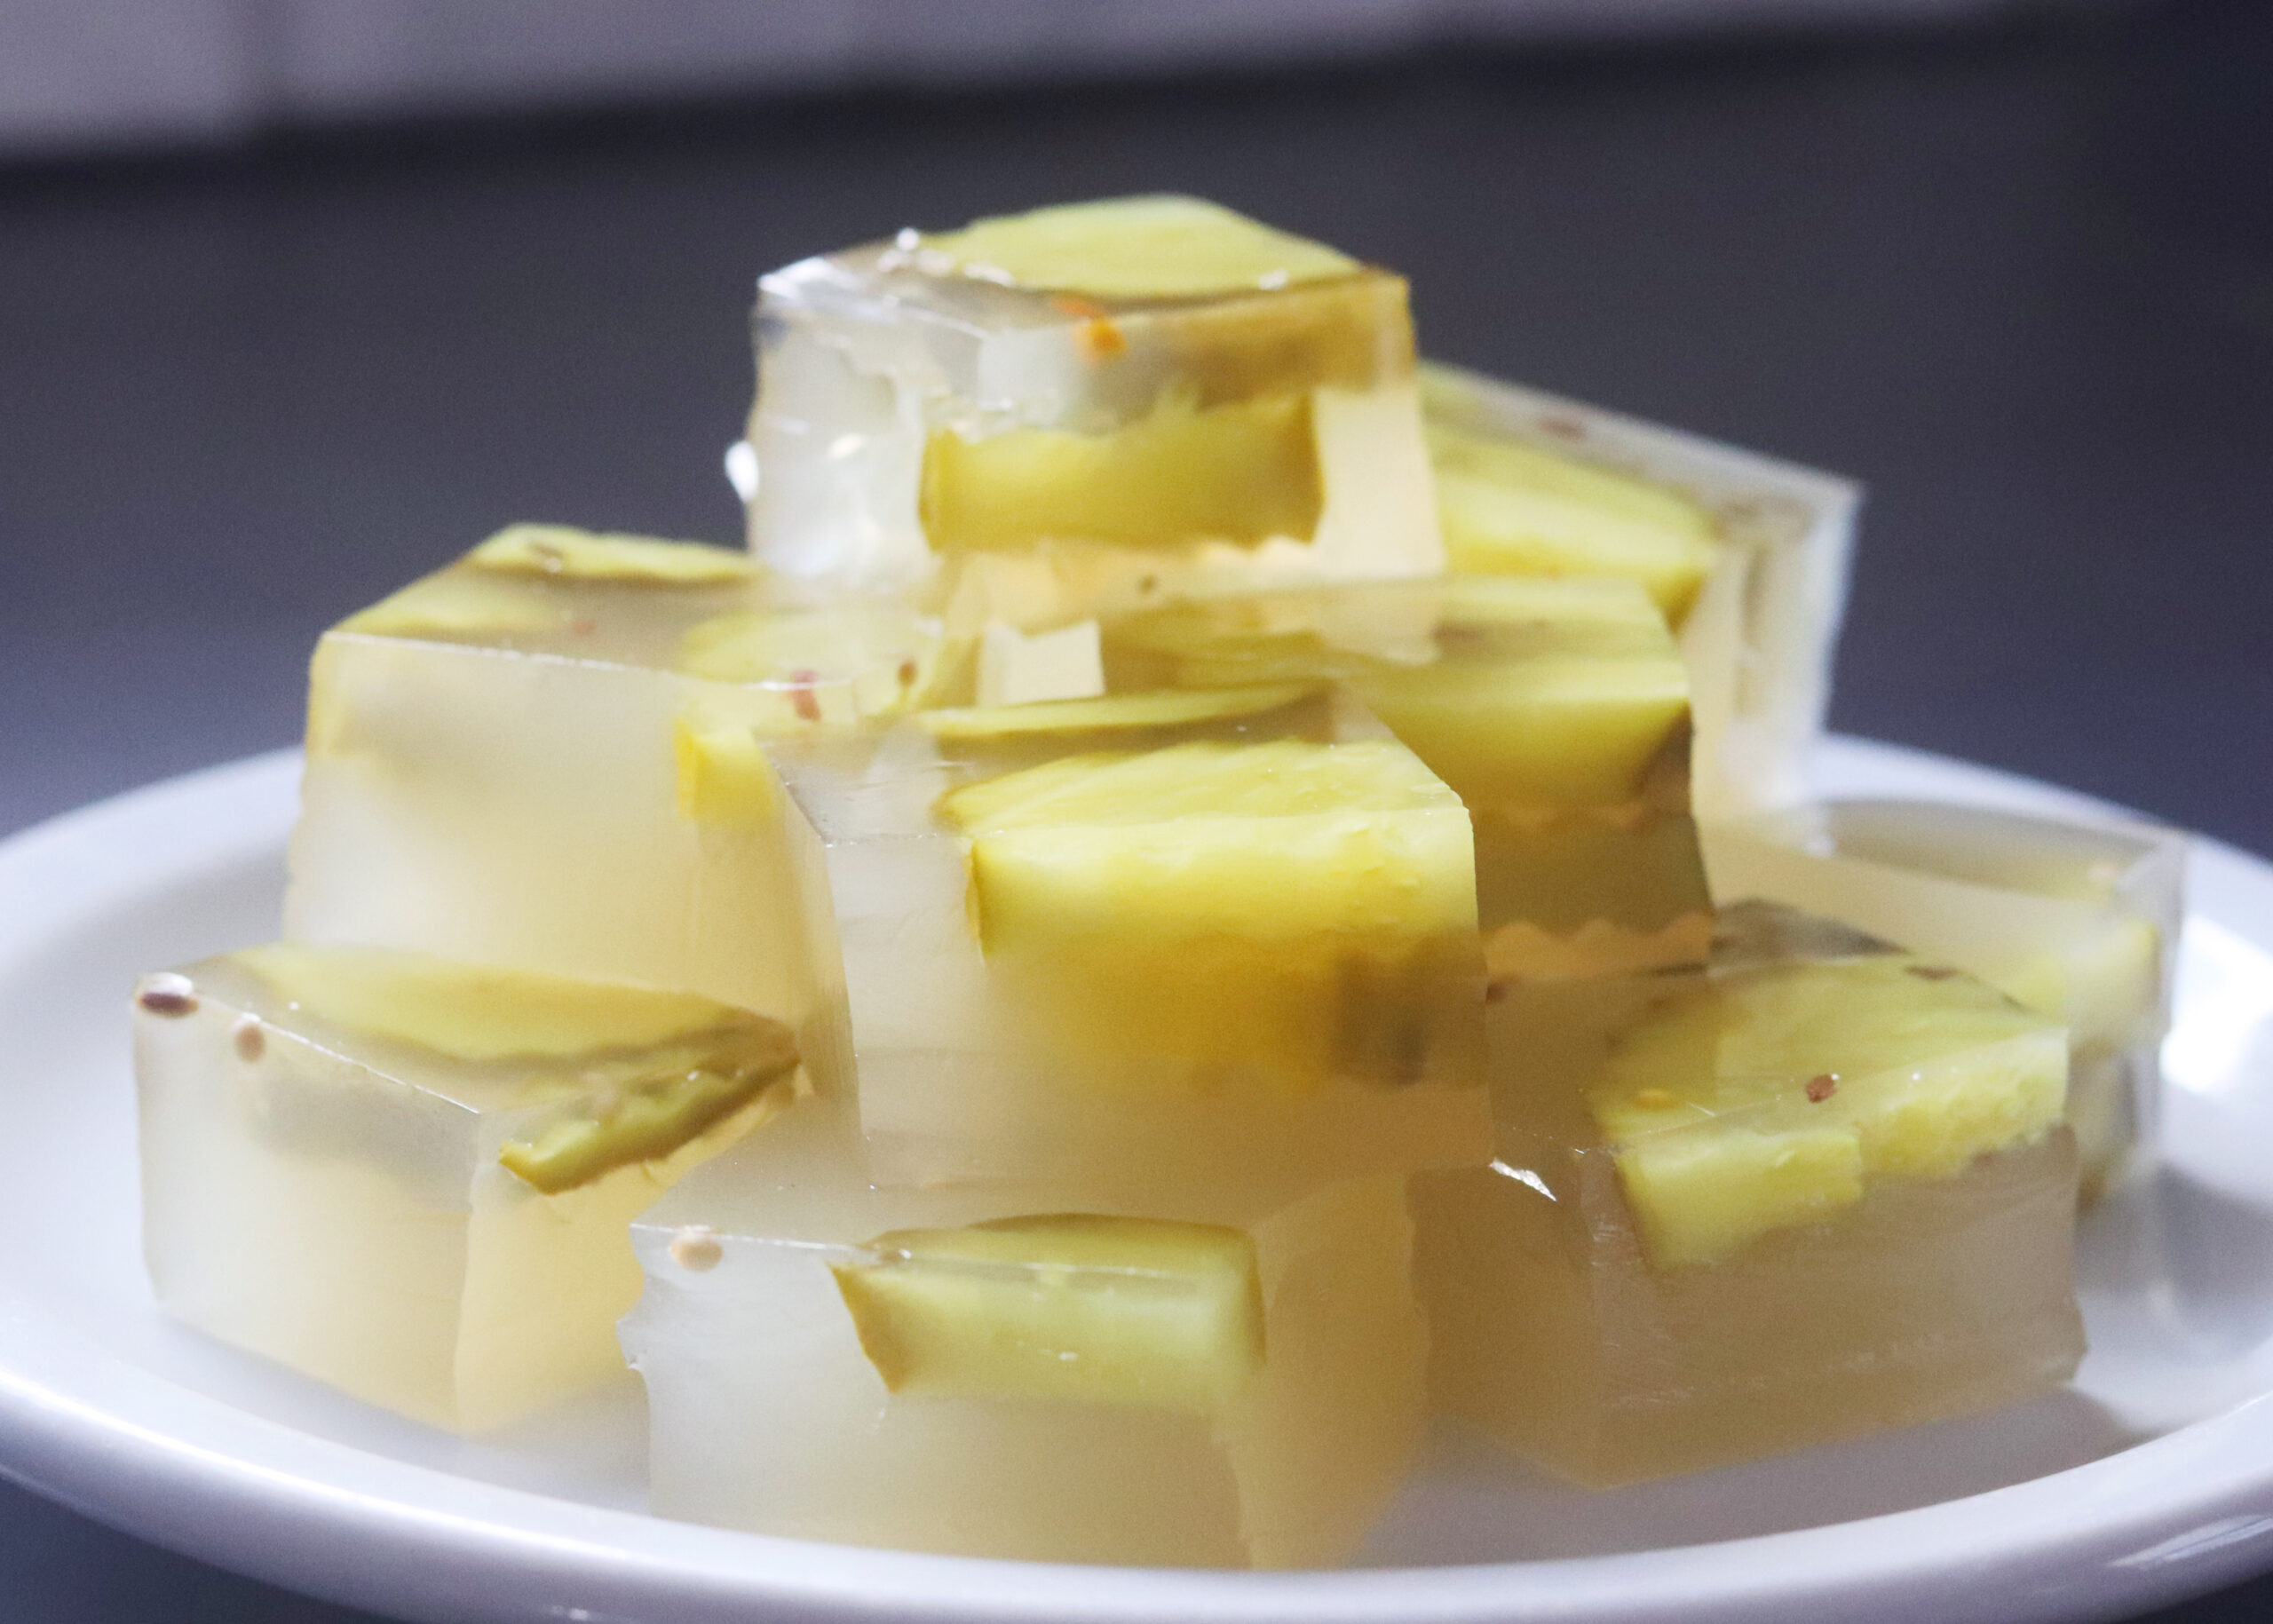 Dill Pickle Gelatin – GAPS, keto